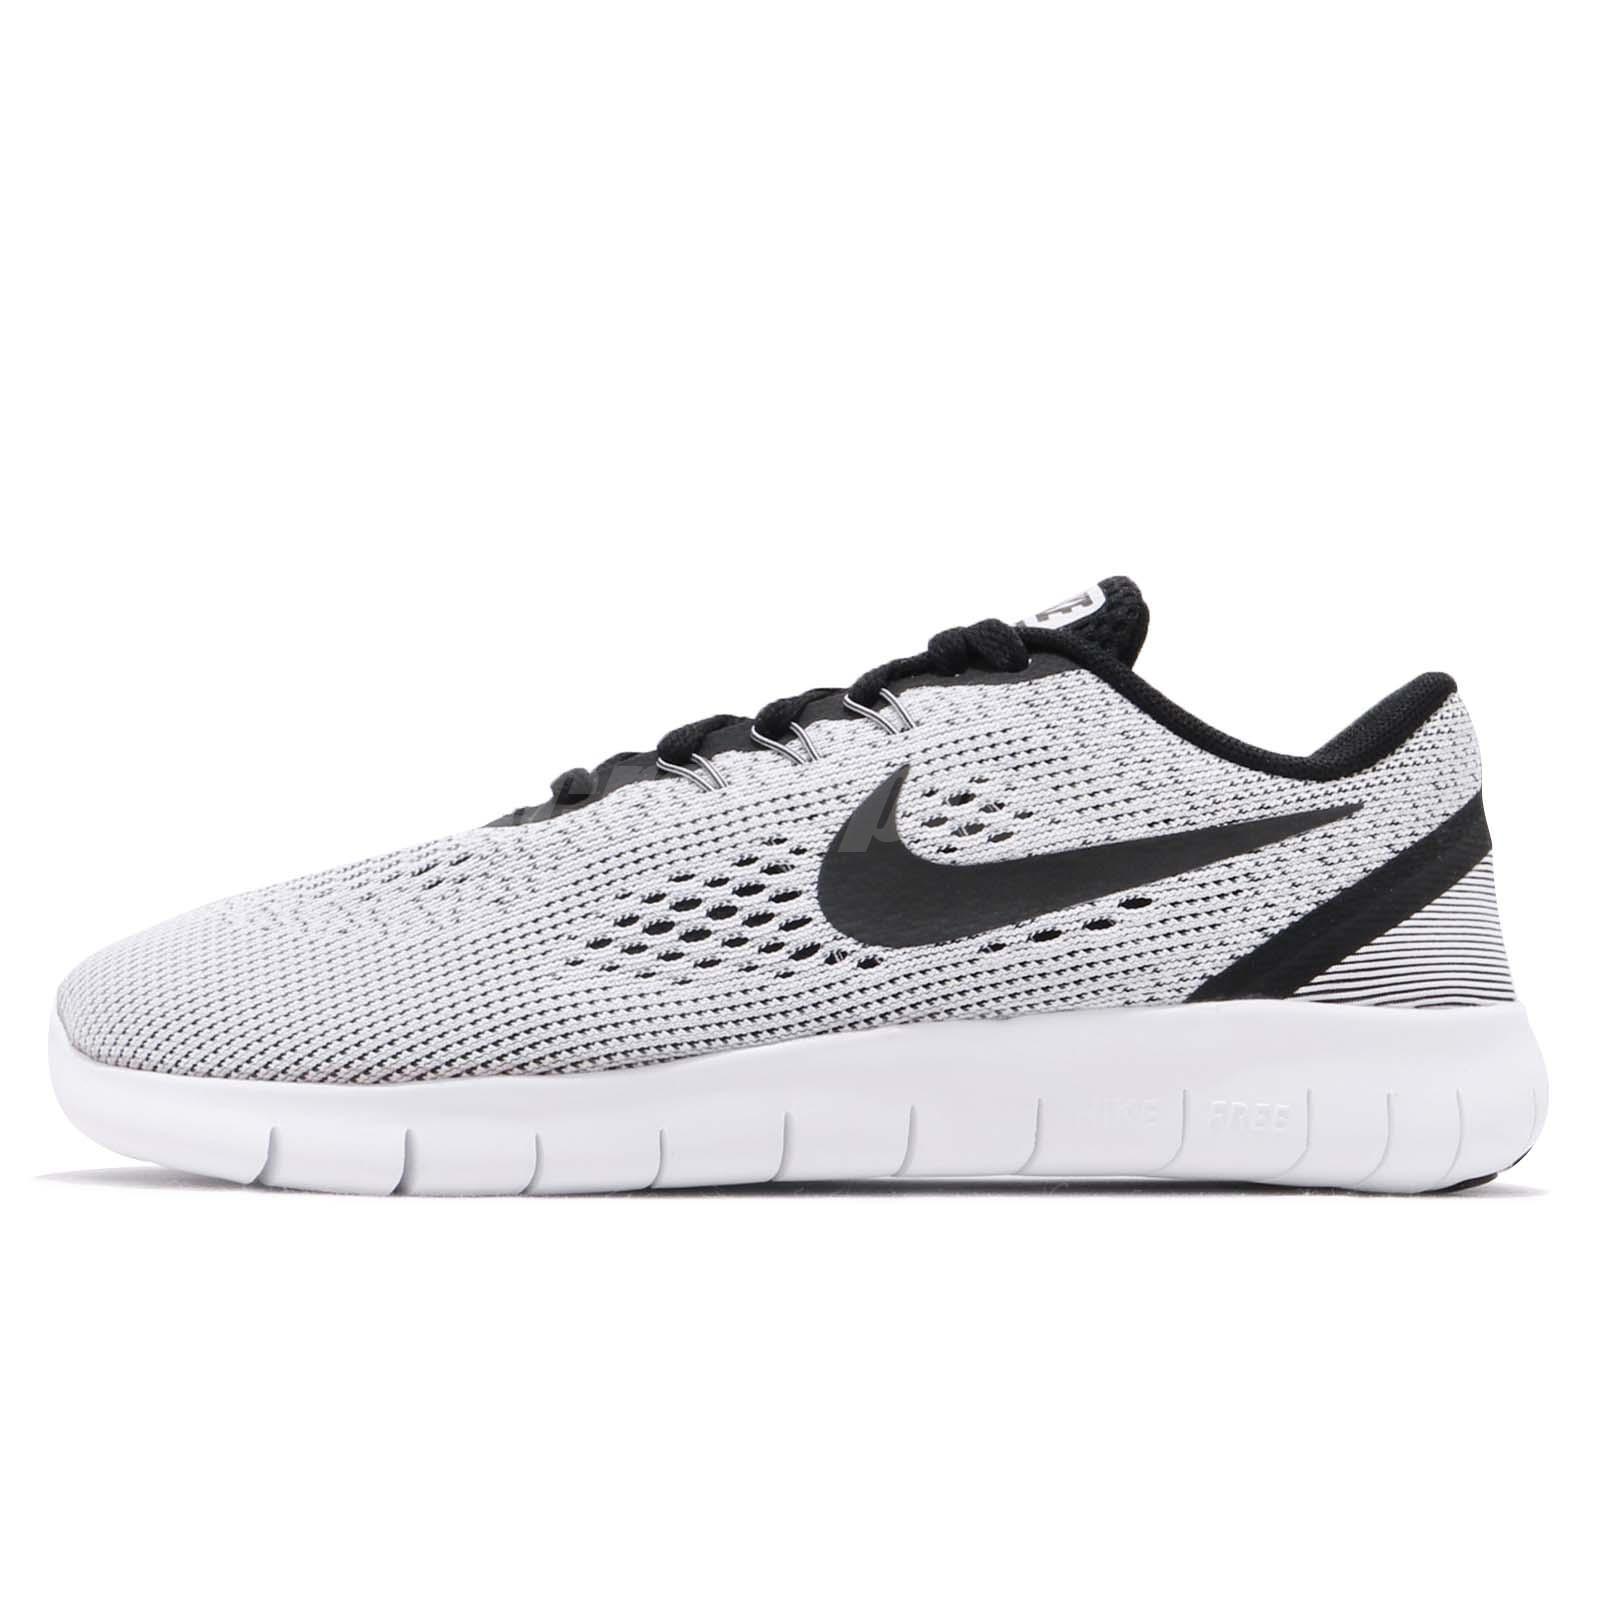 11a96e0aa0a54 Nike Free RN GS Run White Black Kid Youth Women Running Shoes Sneaker 833989 -100